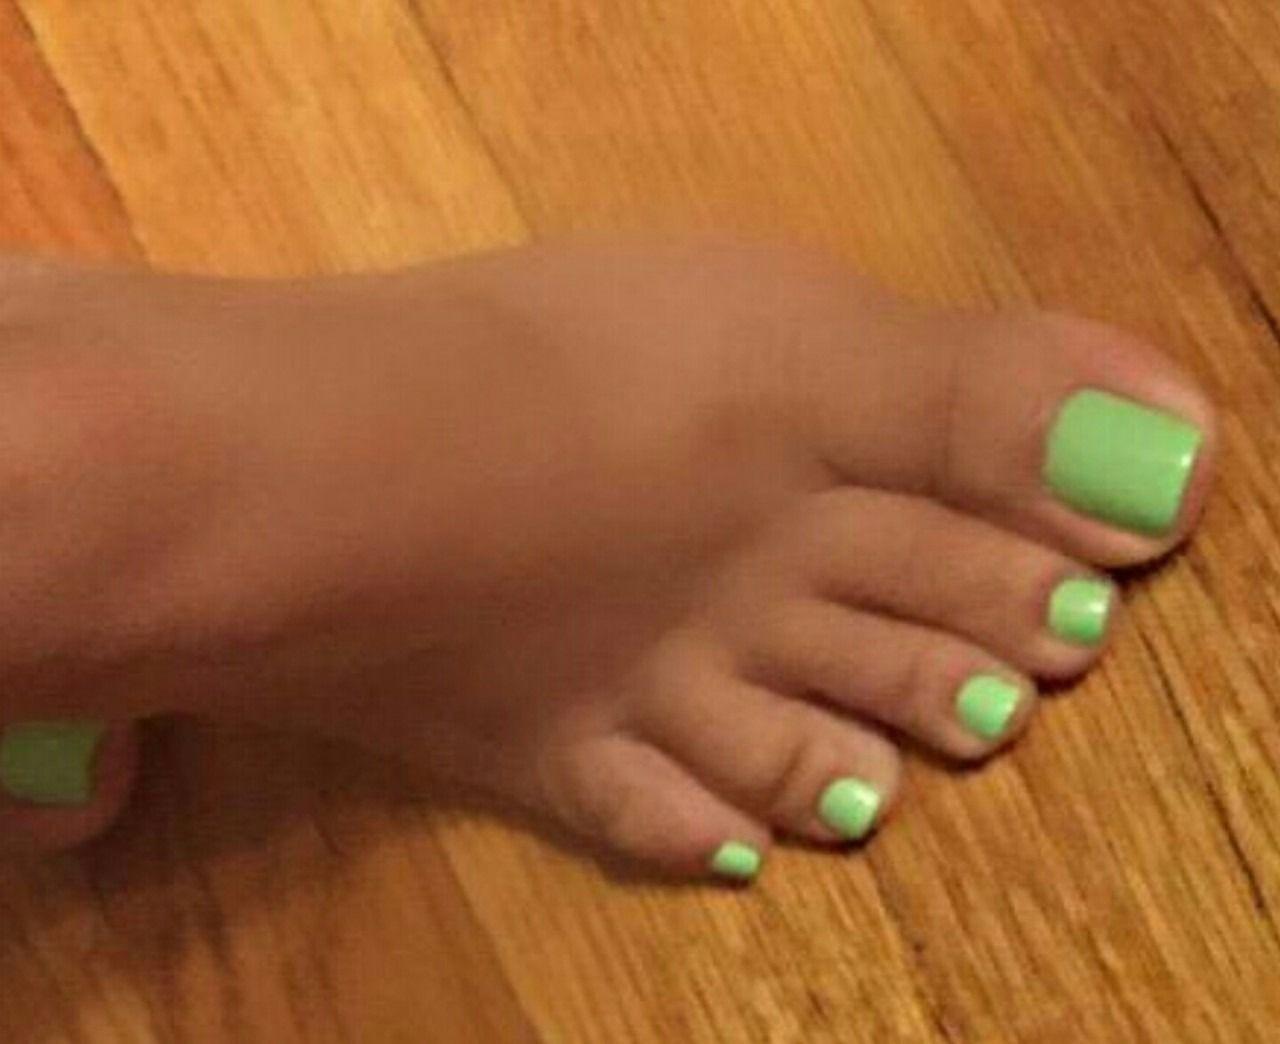 Hottness With Images Green Toe Nails Feet Nails Toe Nails